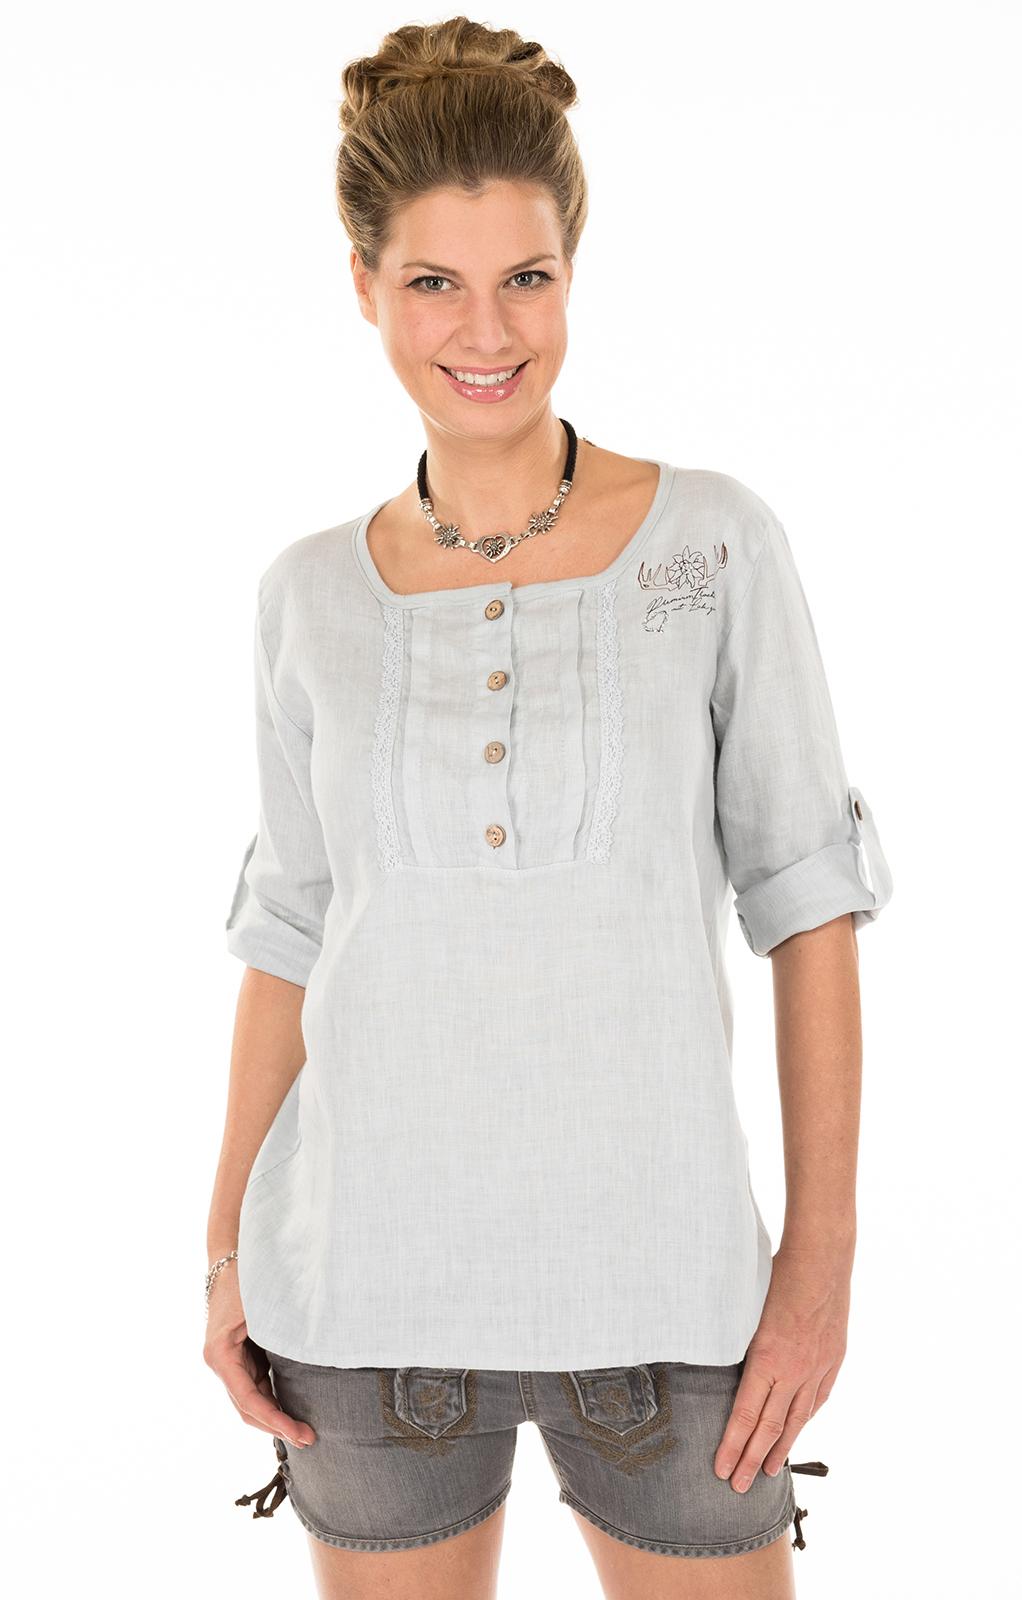 Traditional blouse MERIDA-Tgray von Hangowear